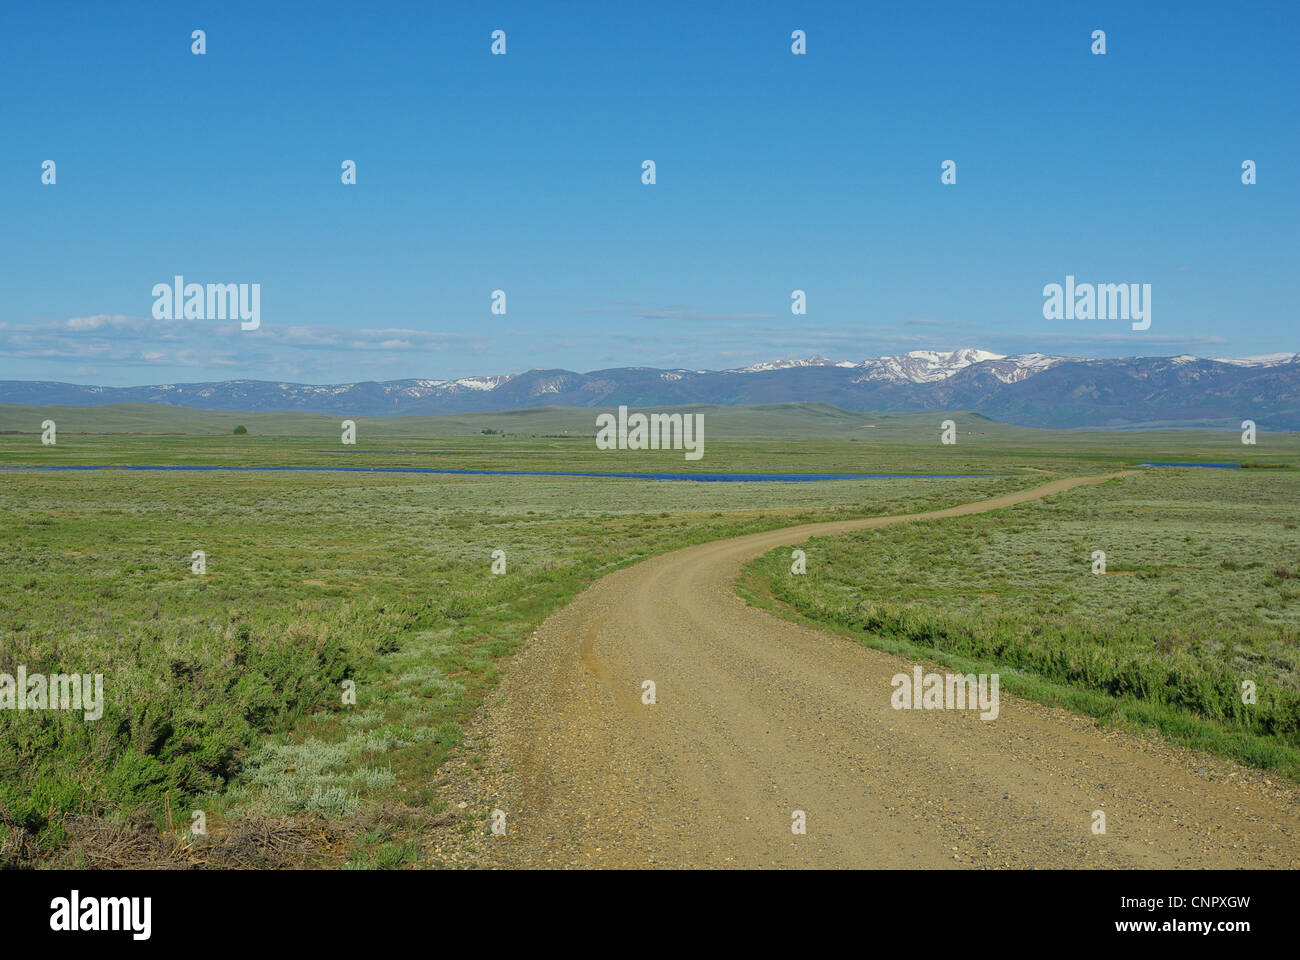 Dirt road through blue lakes to Rockies, Arapaho National Wildlife Refuge, Colorado - Stock Image